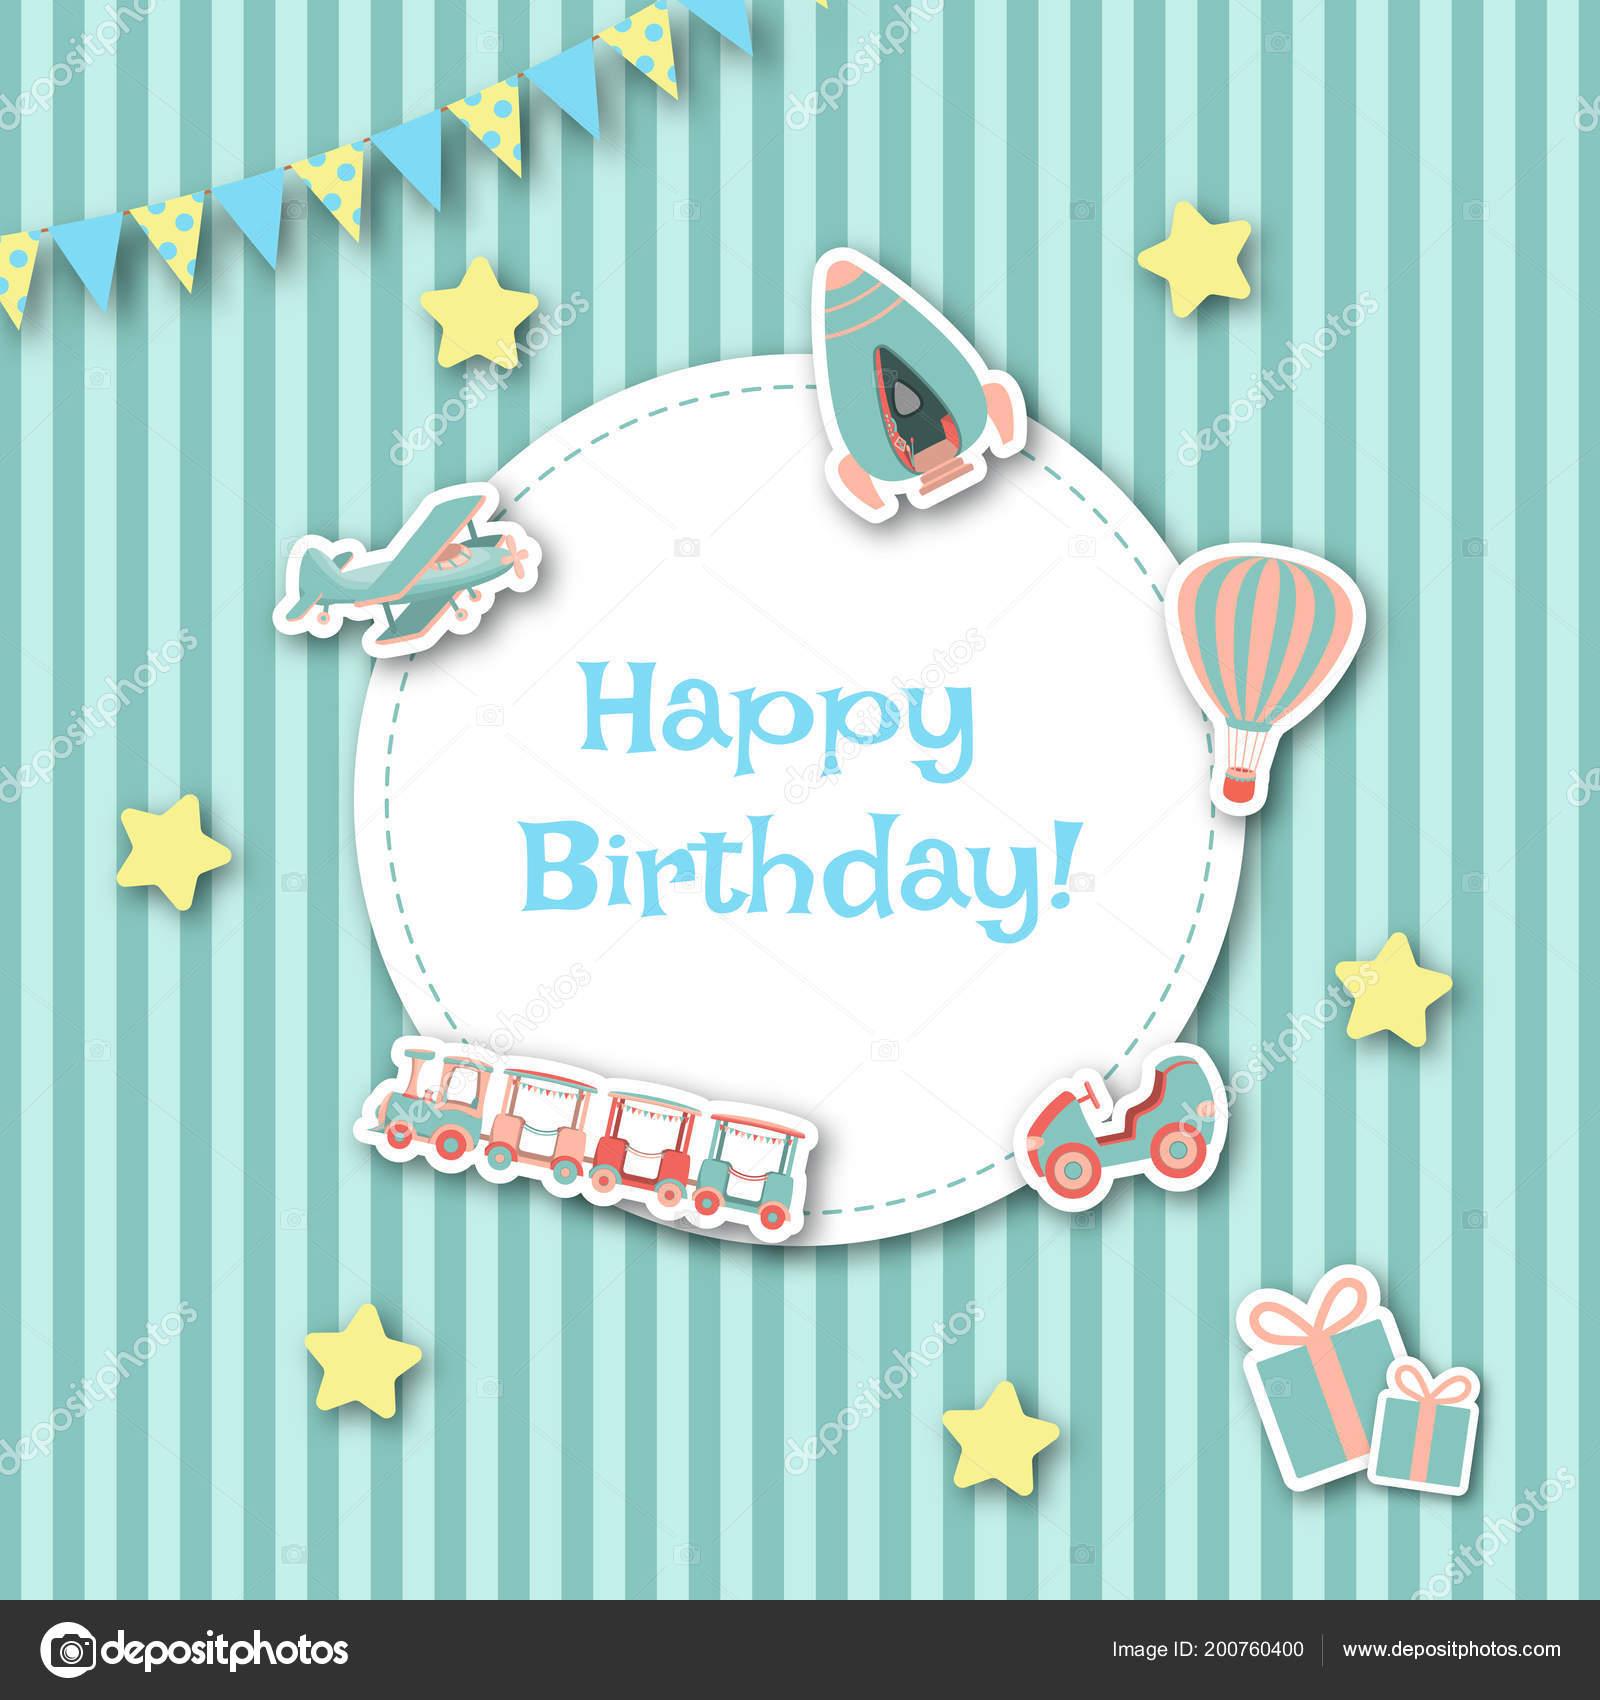 Childish Birthday Card Car Air Balloon Rocket Train Airplane Gift Stock Vector